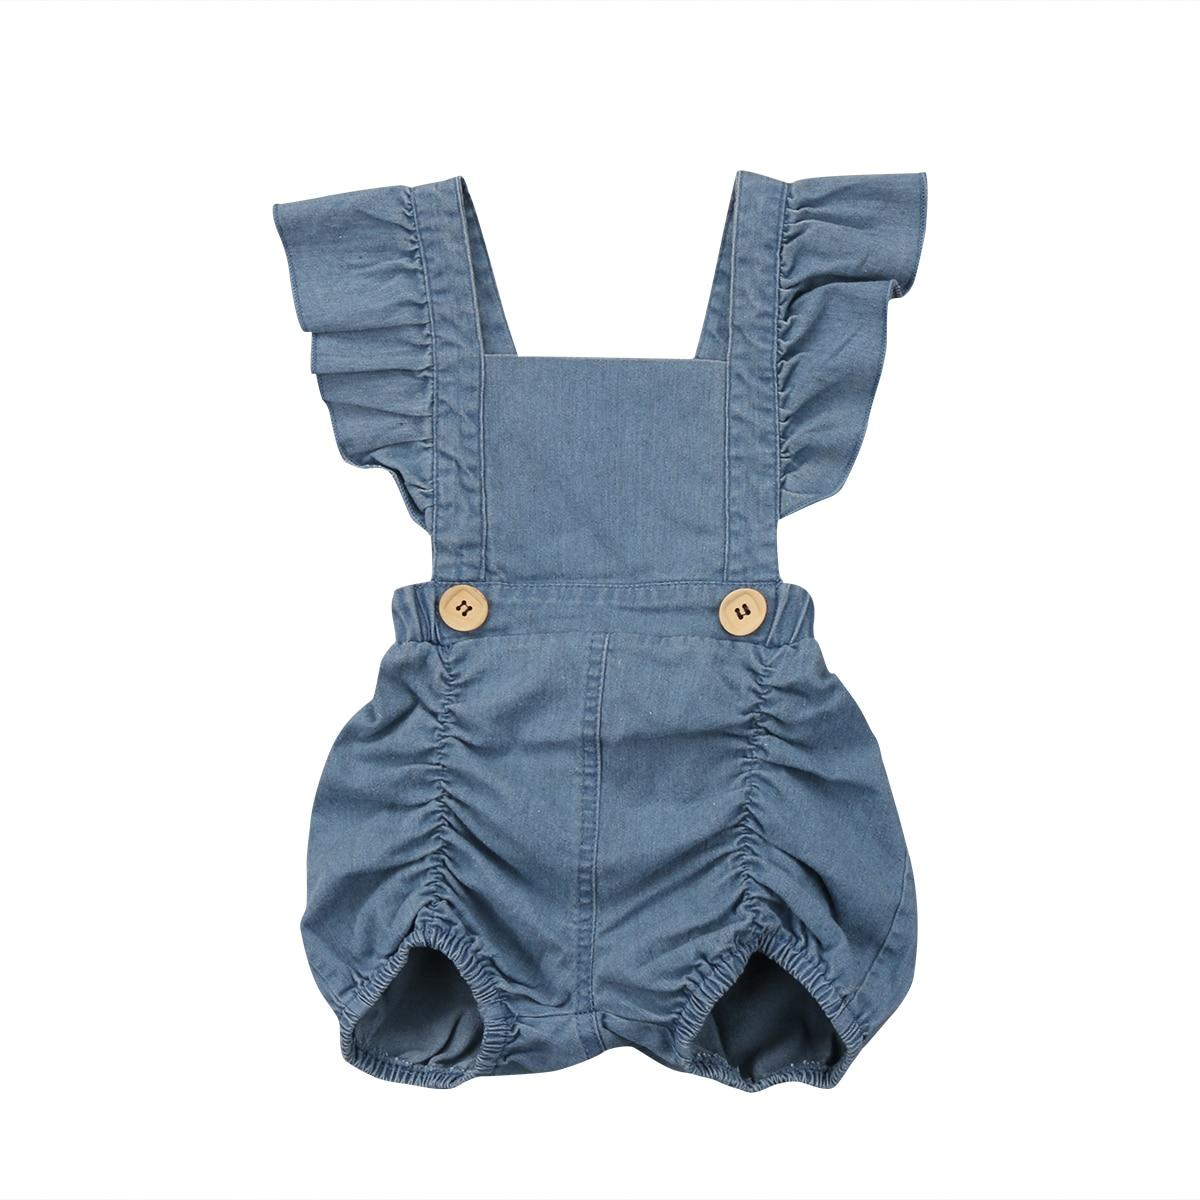 Pudcoco 2017 Fashion Baby girls clothes Off shoulder Newborn baby girls denim romper princess baby girls clothing